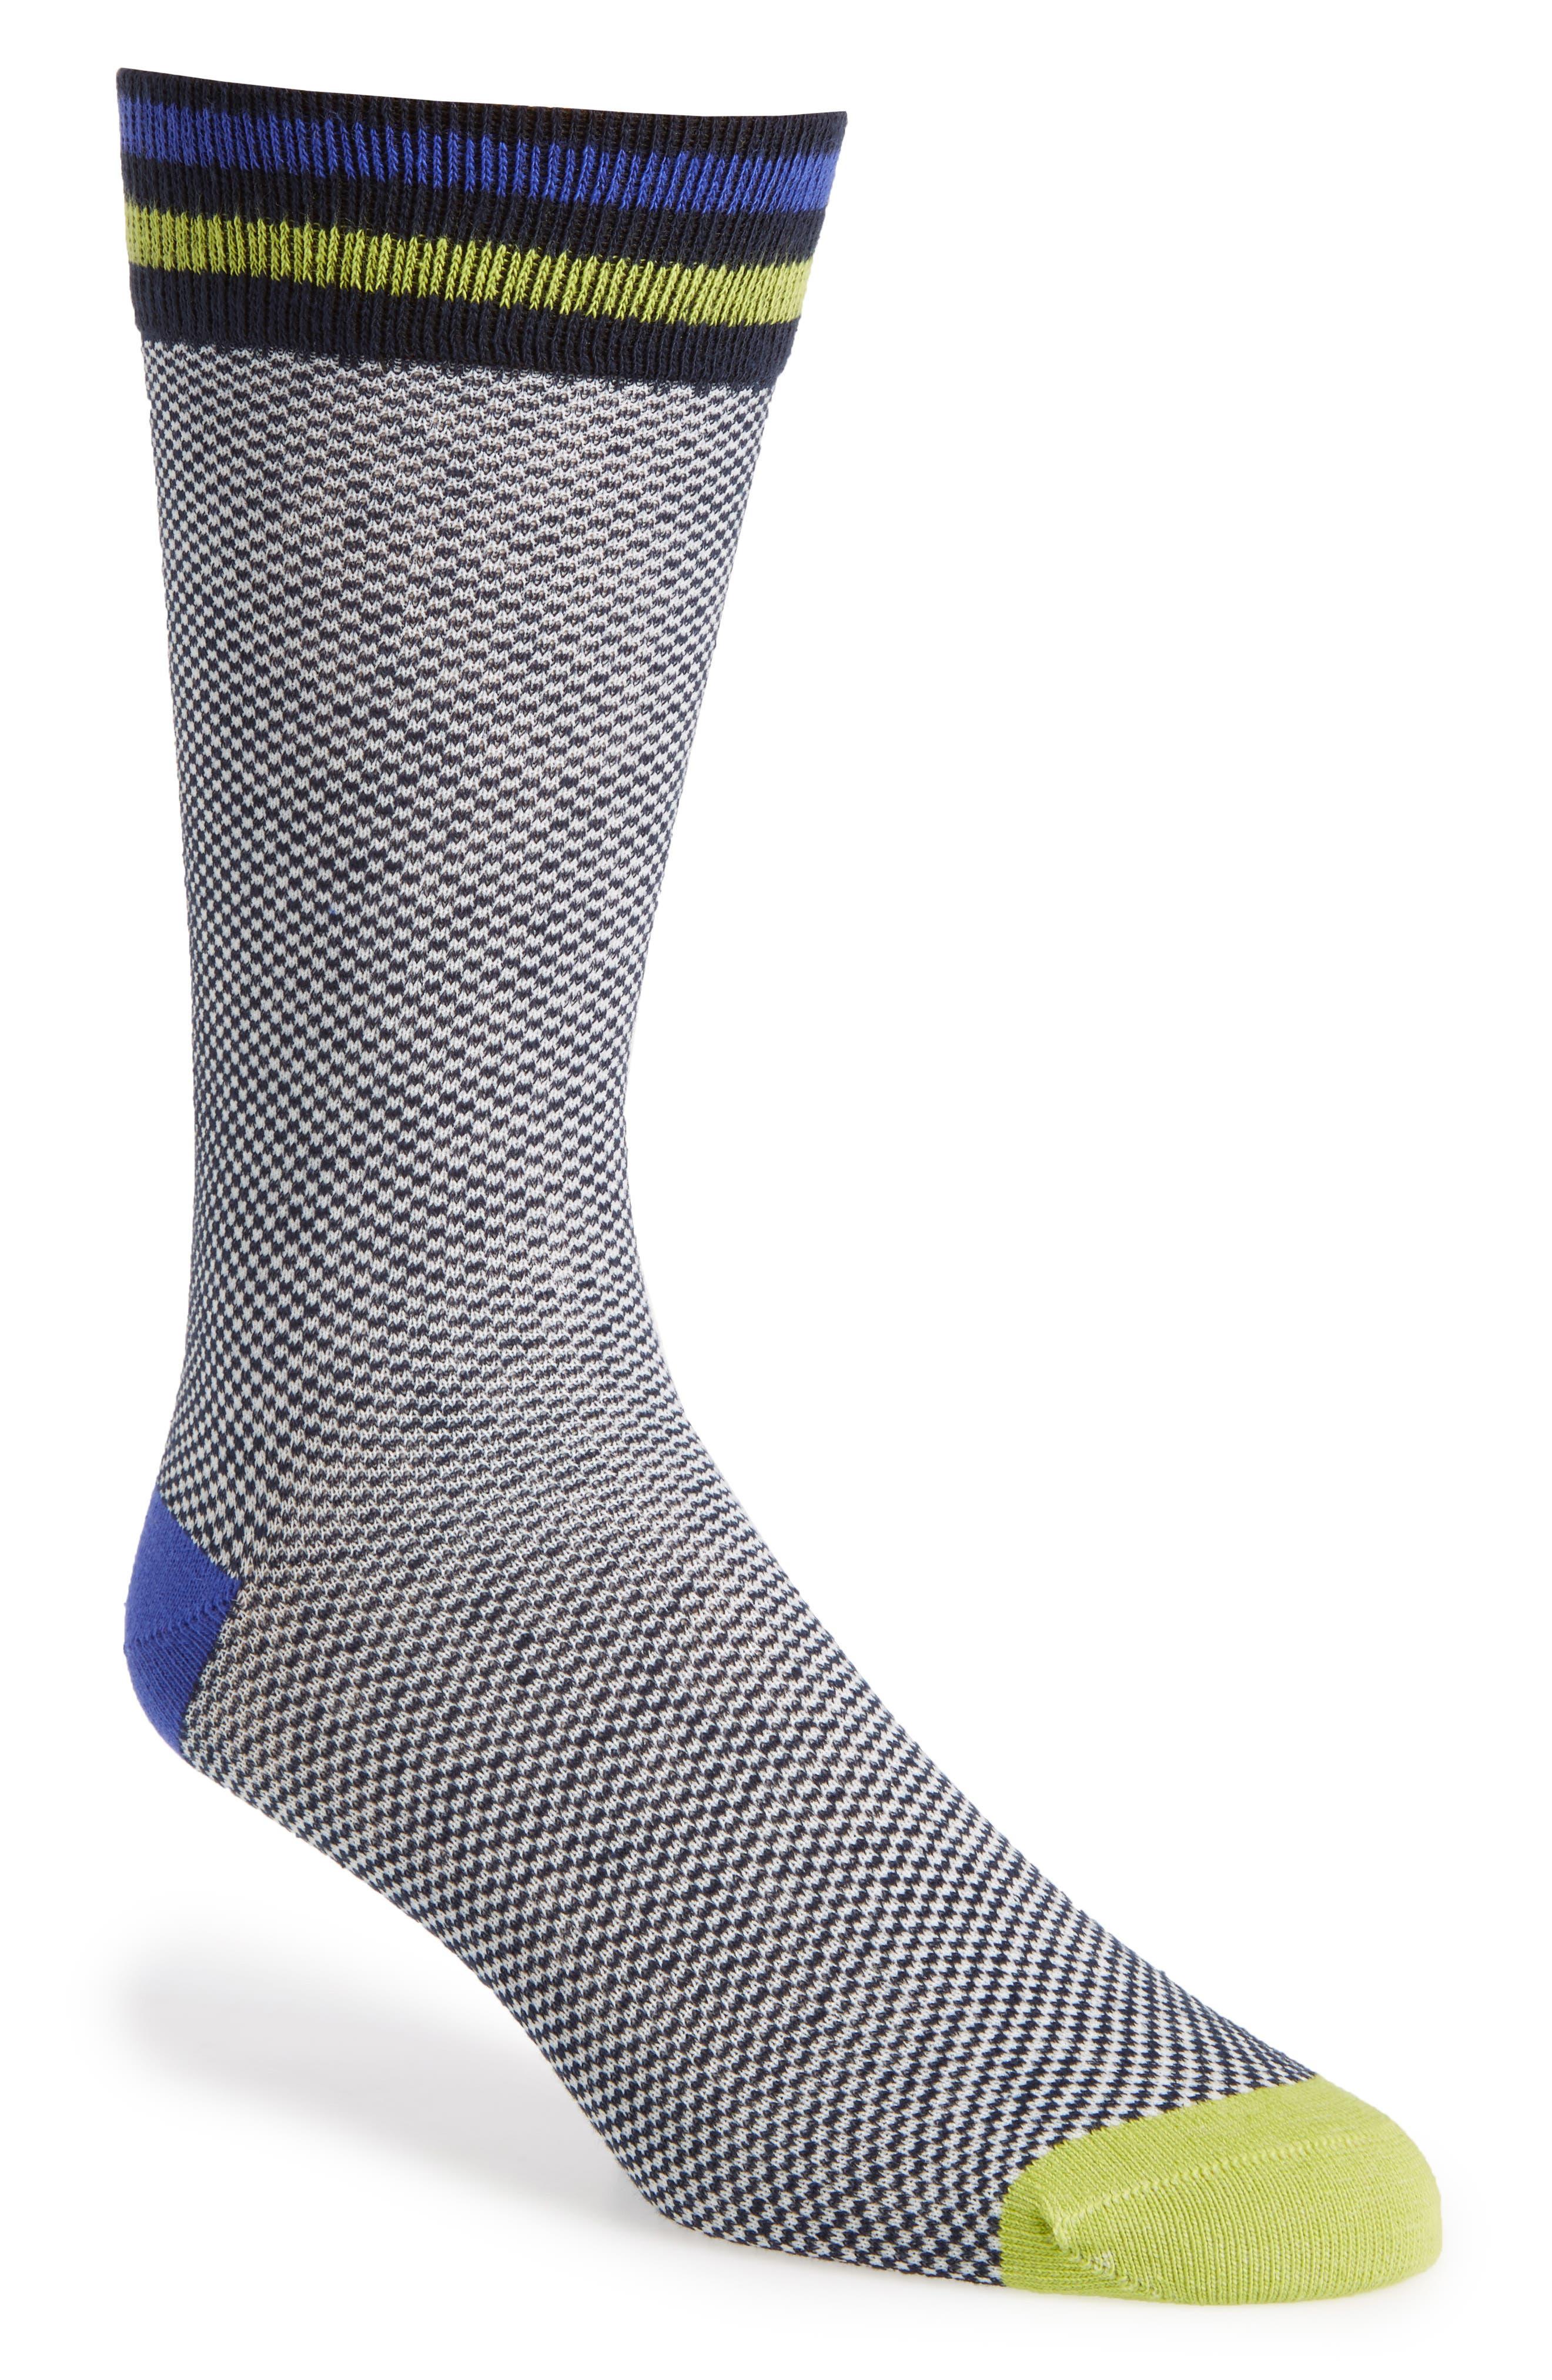 Oxford Socks,                             Main thumbnail 1, color,                             Navy/ White